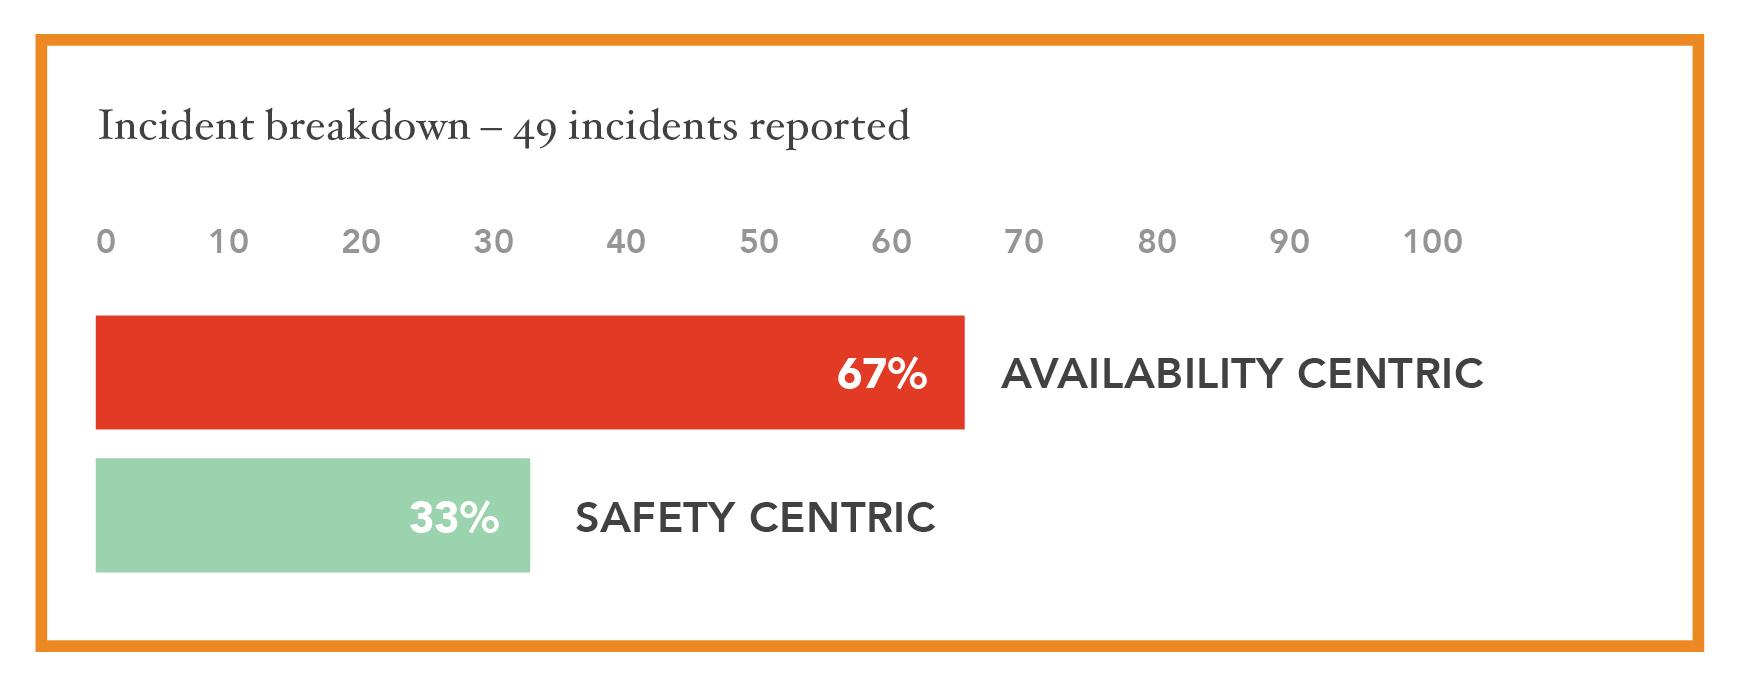 Figure 5: Incidents